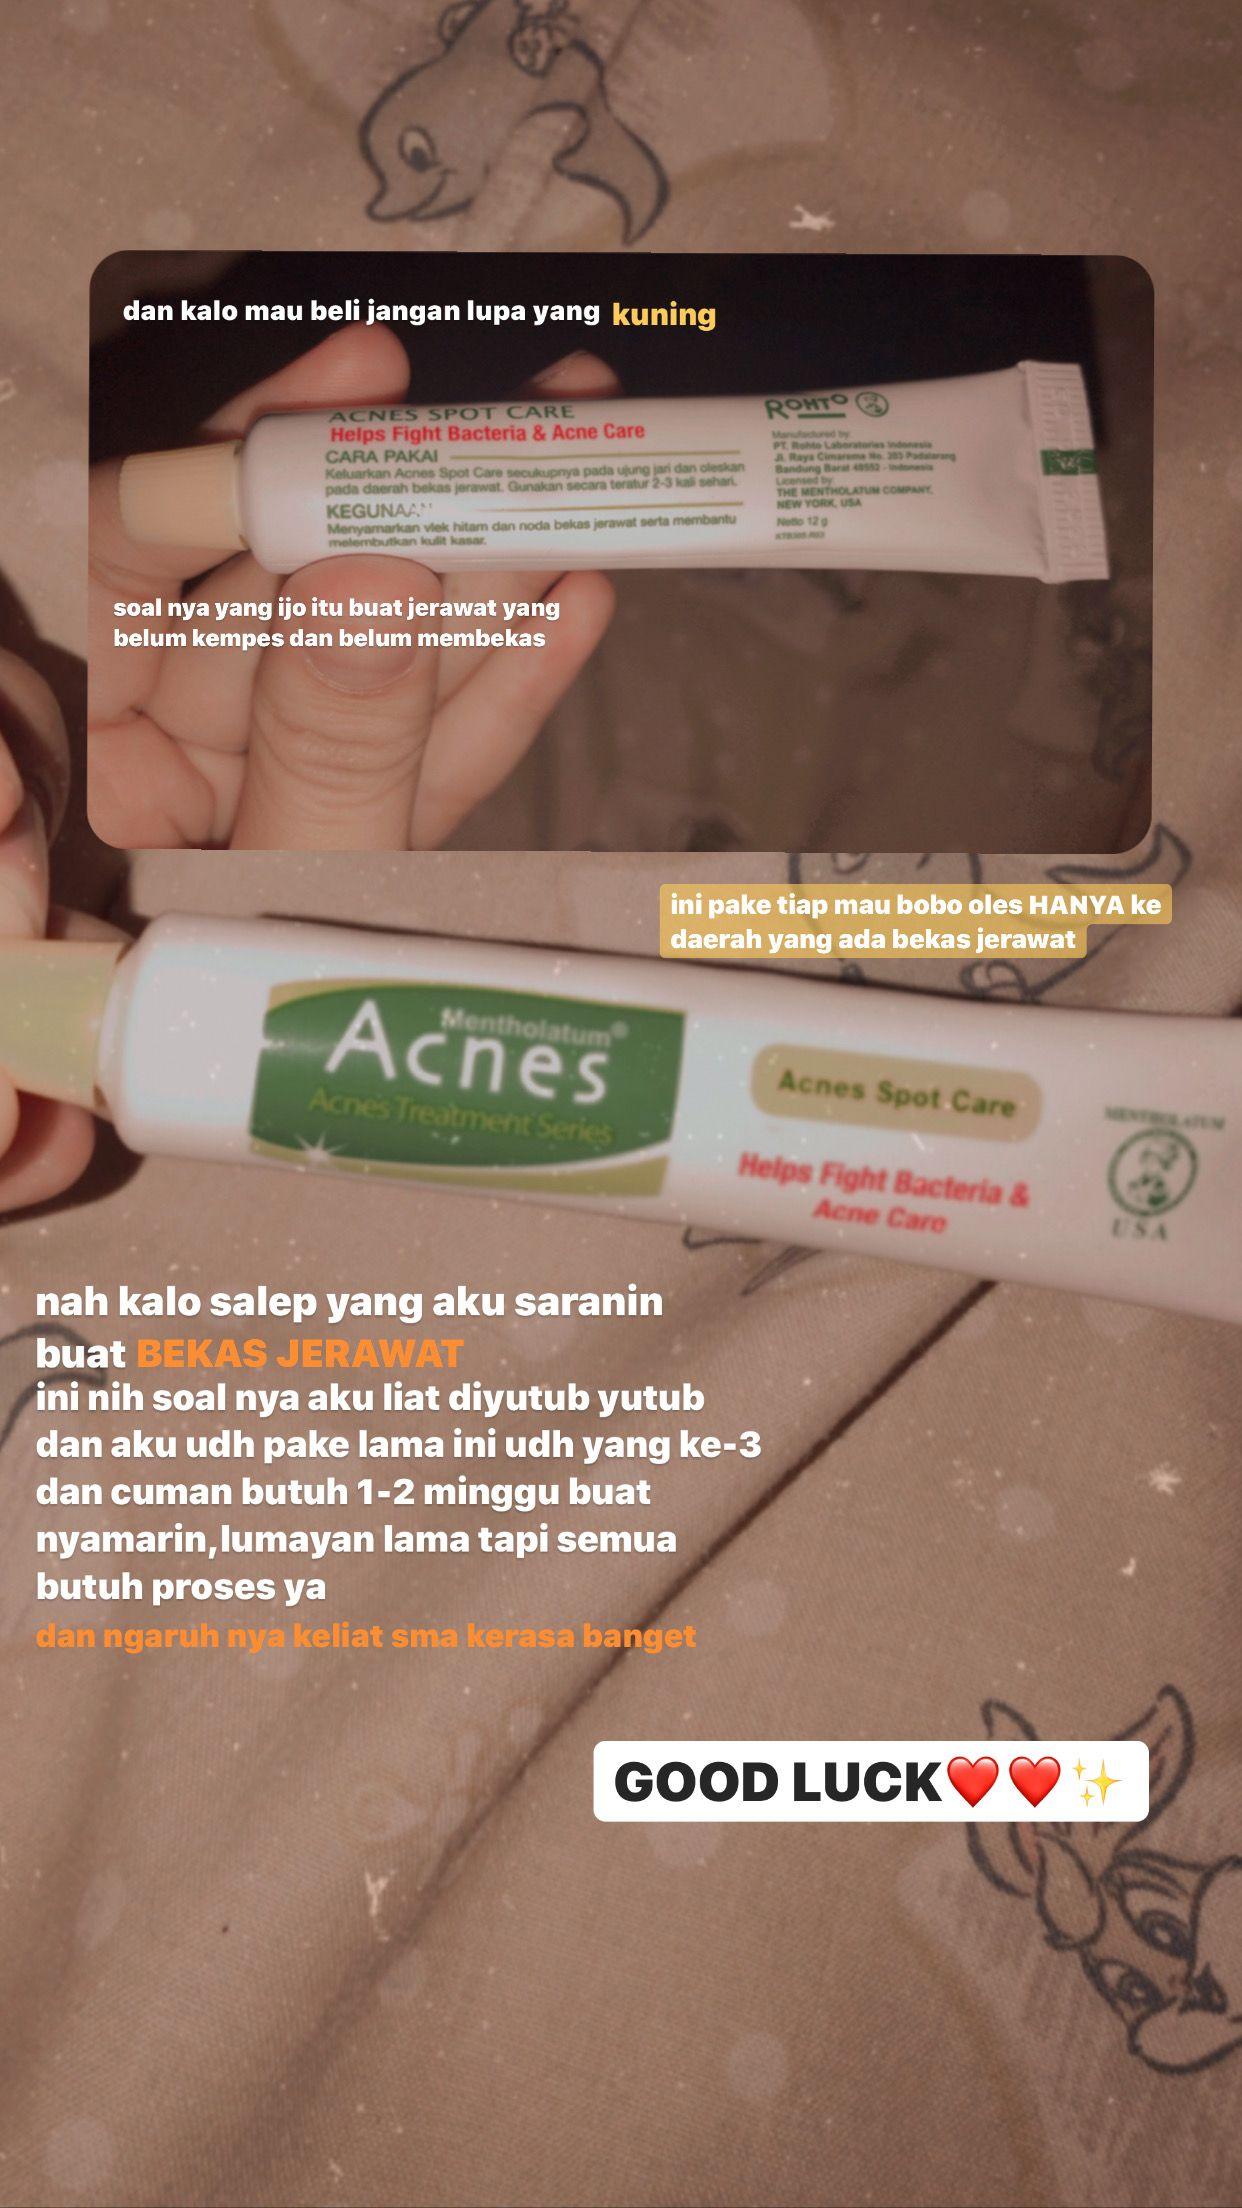 Sabun Muka Acnes Untuk Menghilangkan Bekas Jerawat